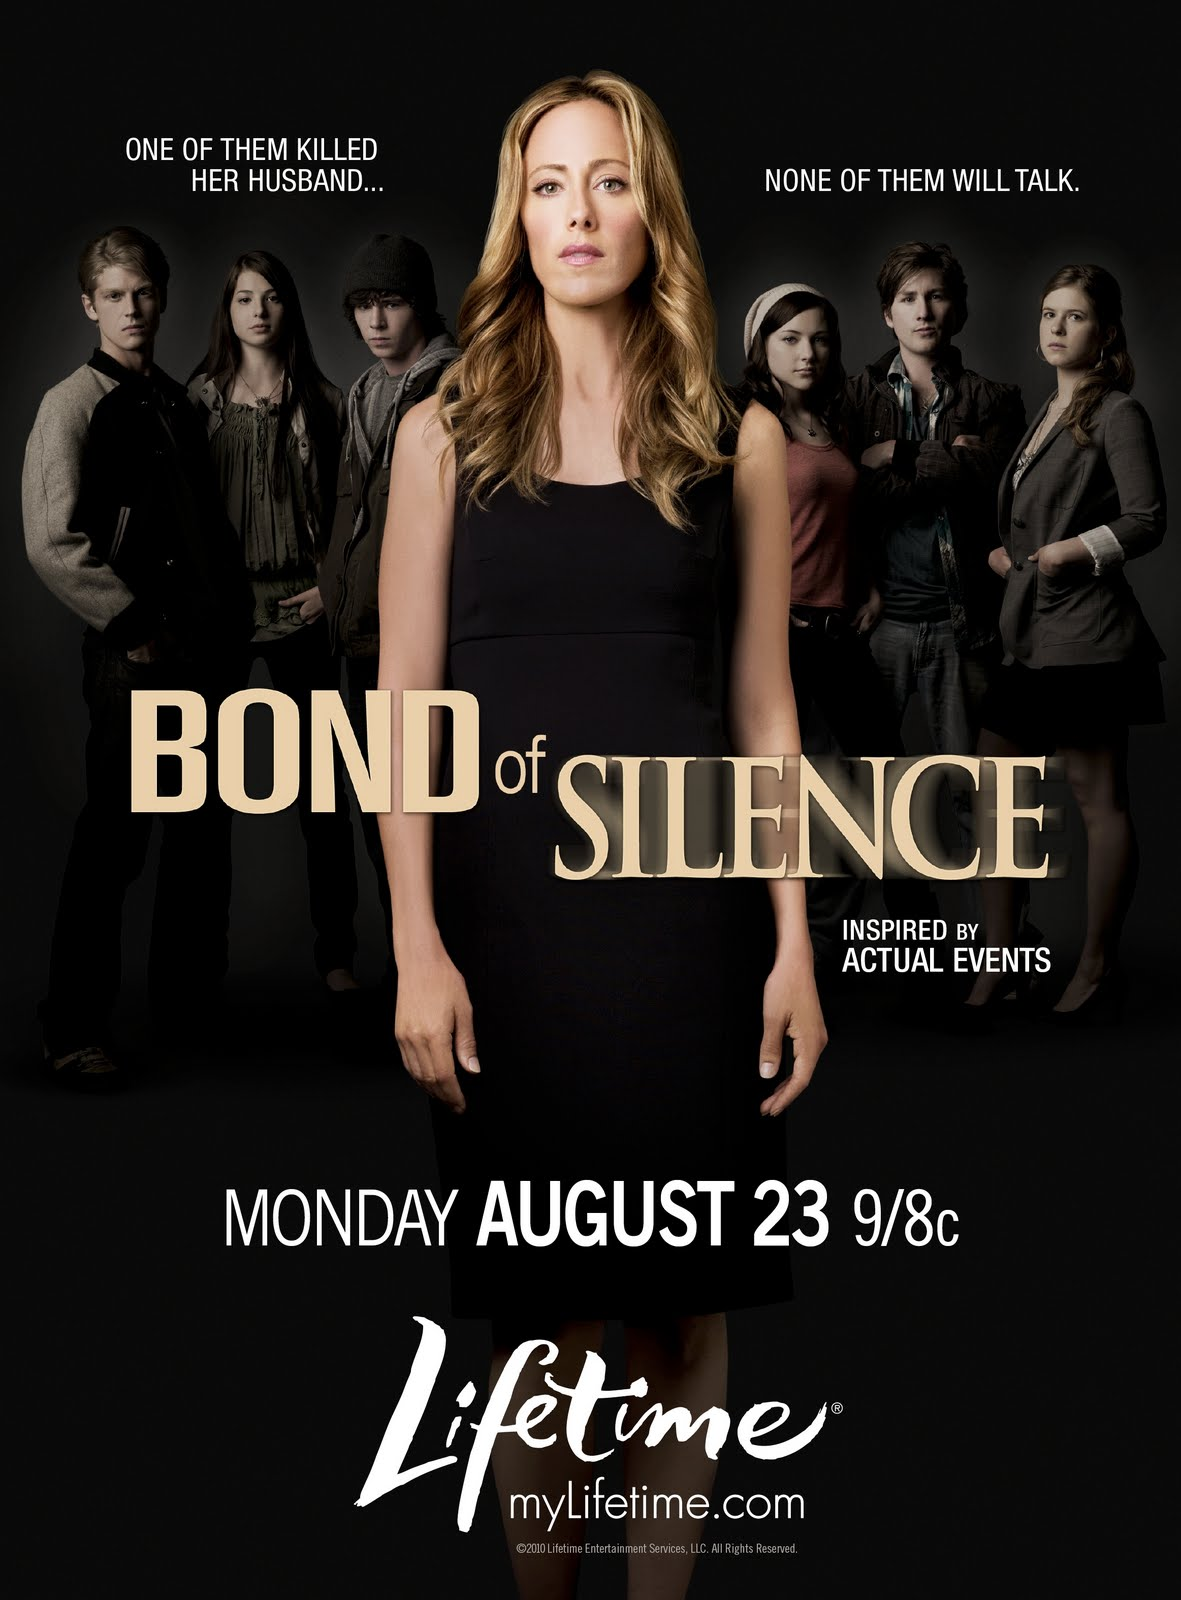 Bond Of Silence STV VOSTFR 2010 DVDRip [FS]